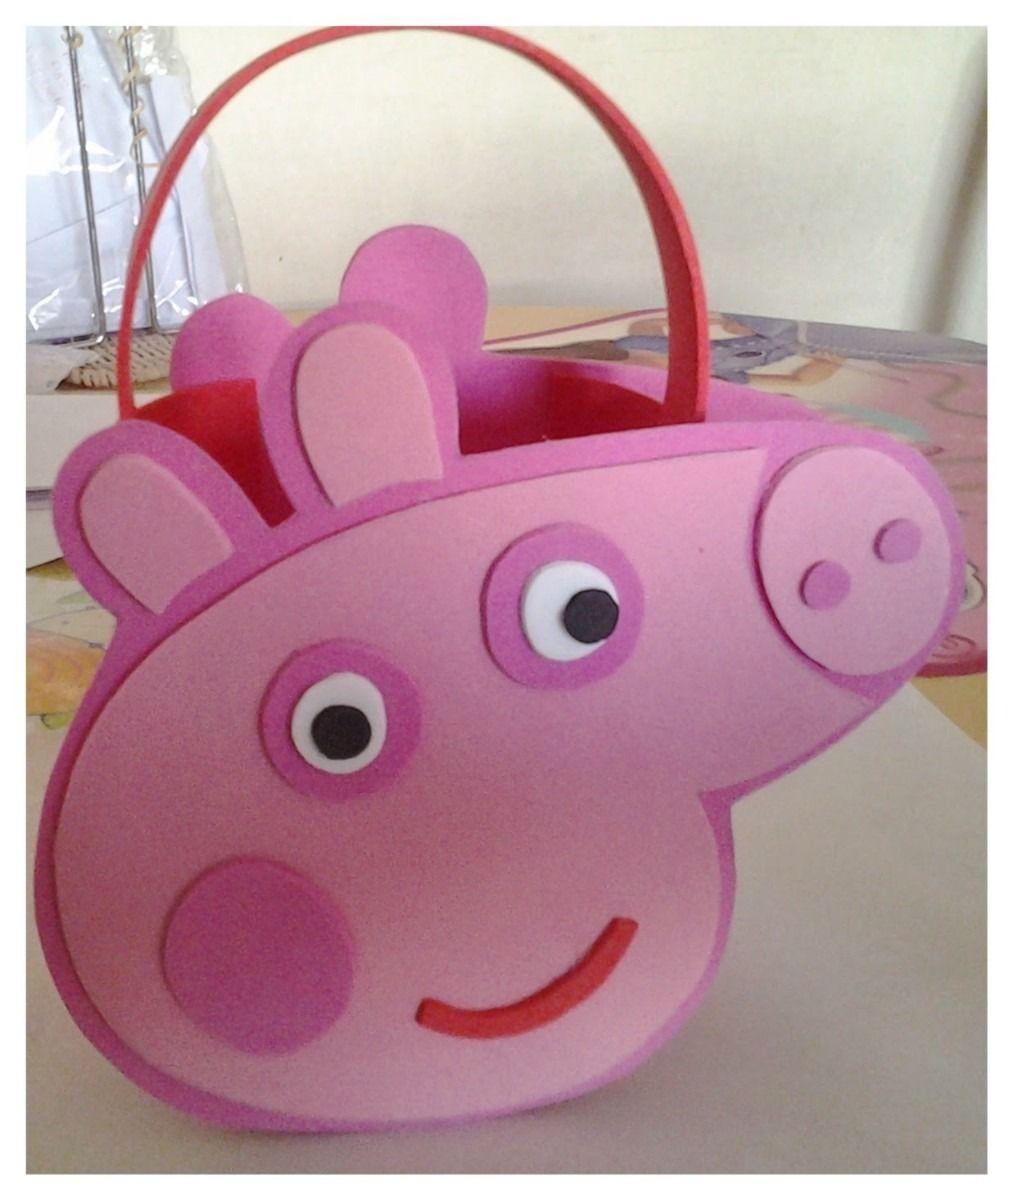 2b8b6b2f9 Sorpresas De Cumpleaños Peppa Pig - $ 690 en MercadoLibre | Patricia ...